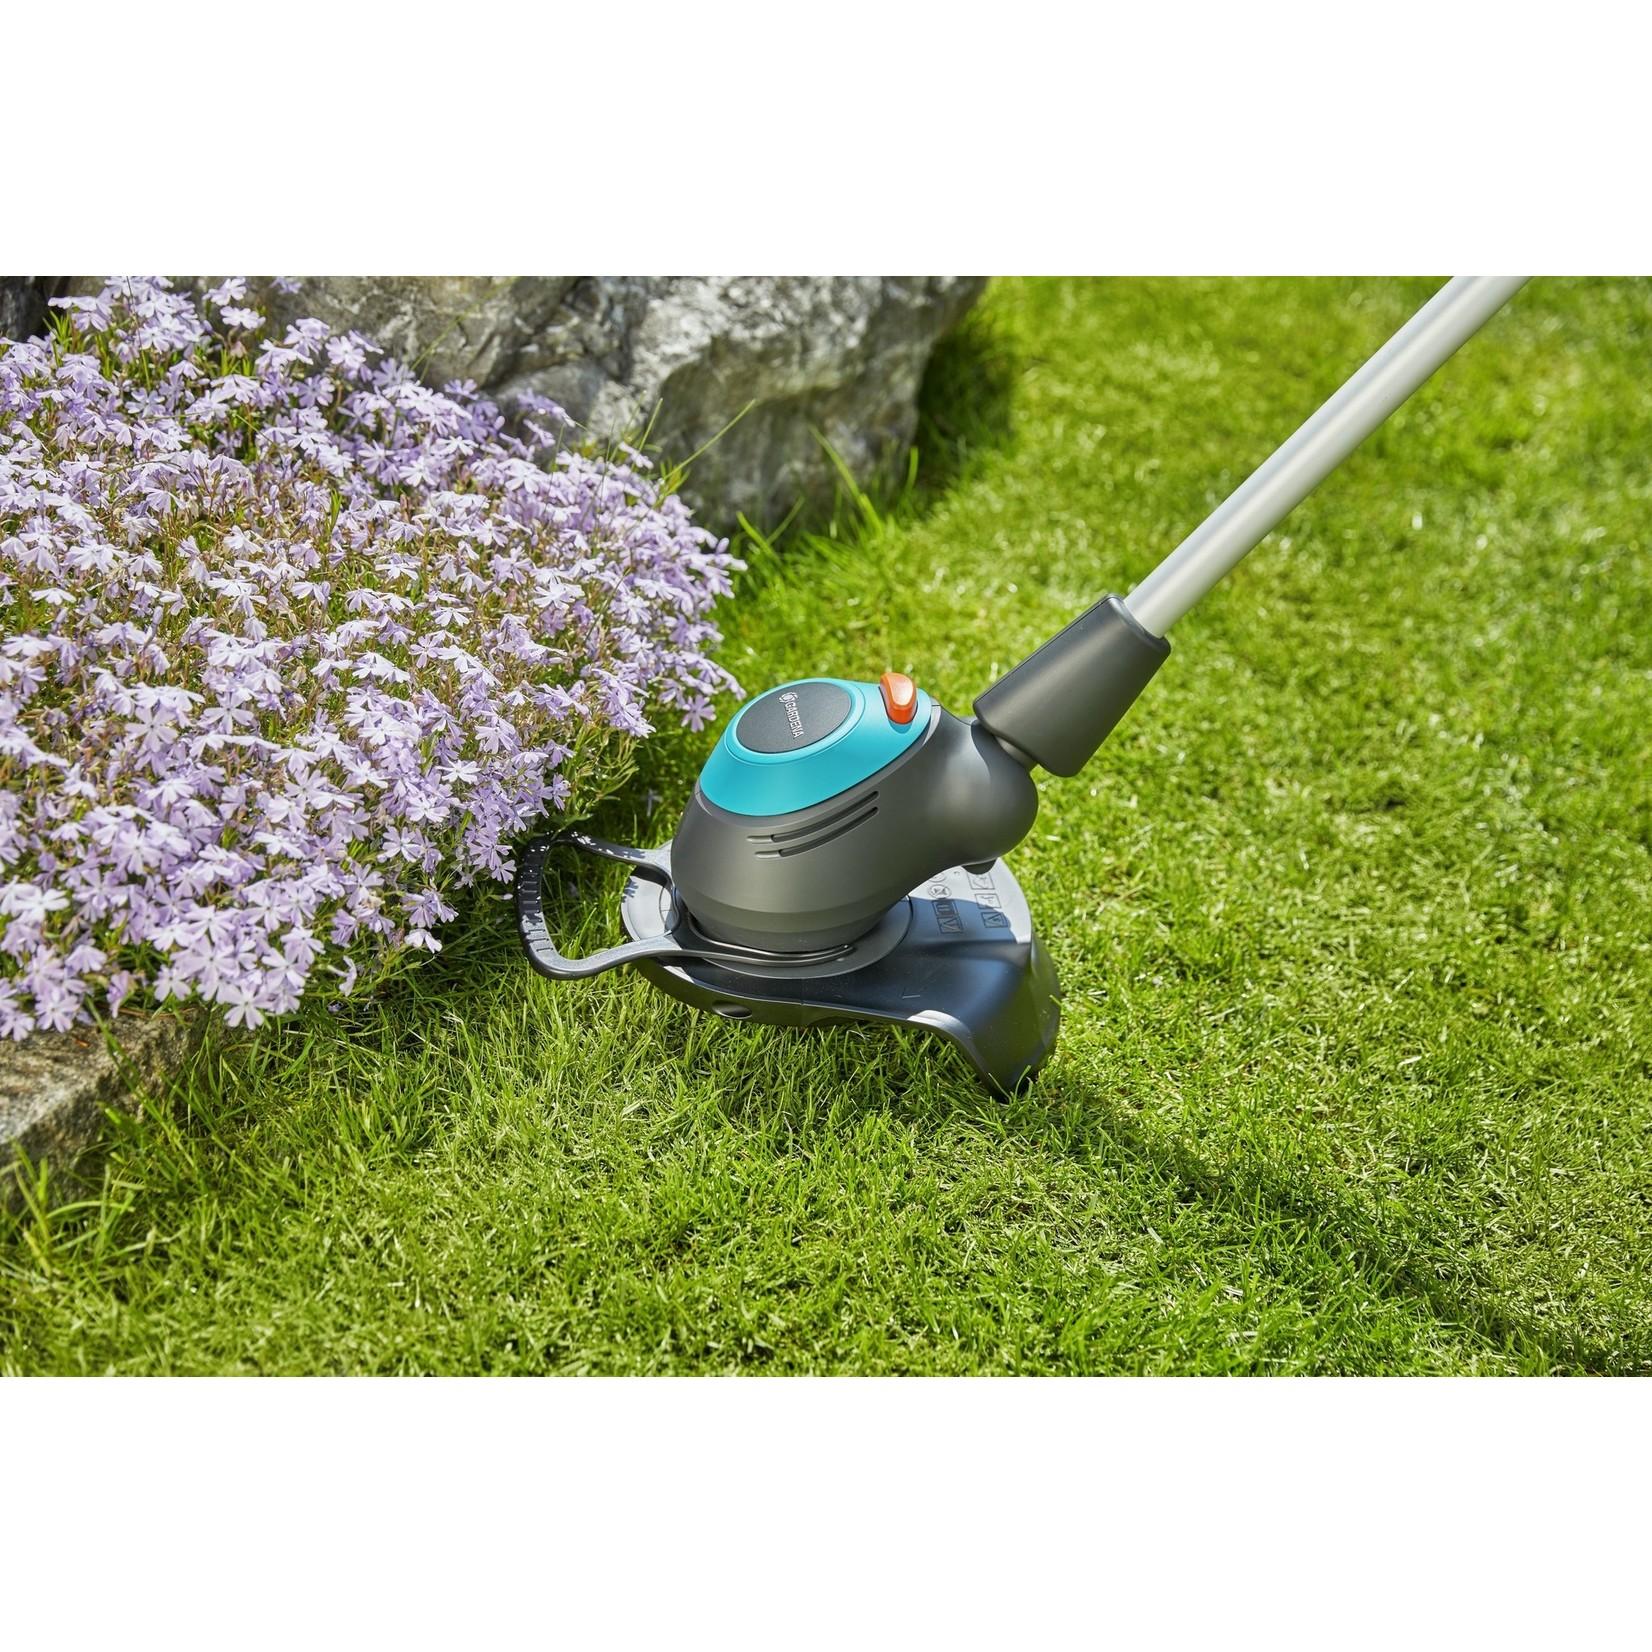 Gardena Gardena Trimmer EasyCut 450/25